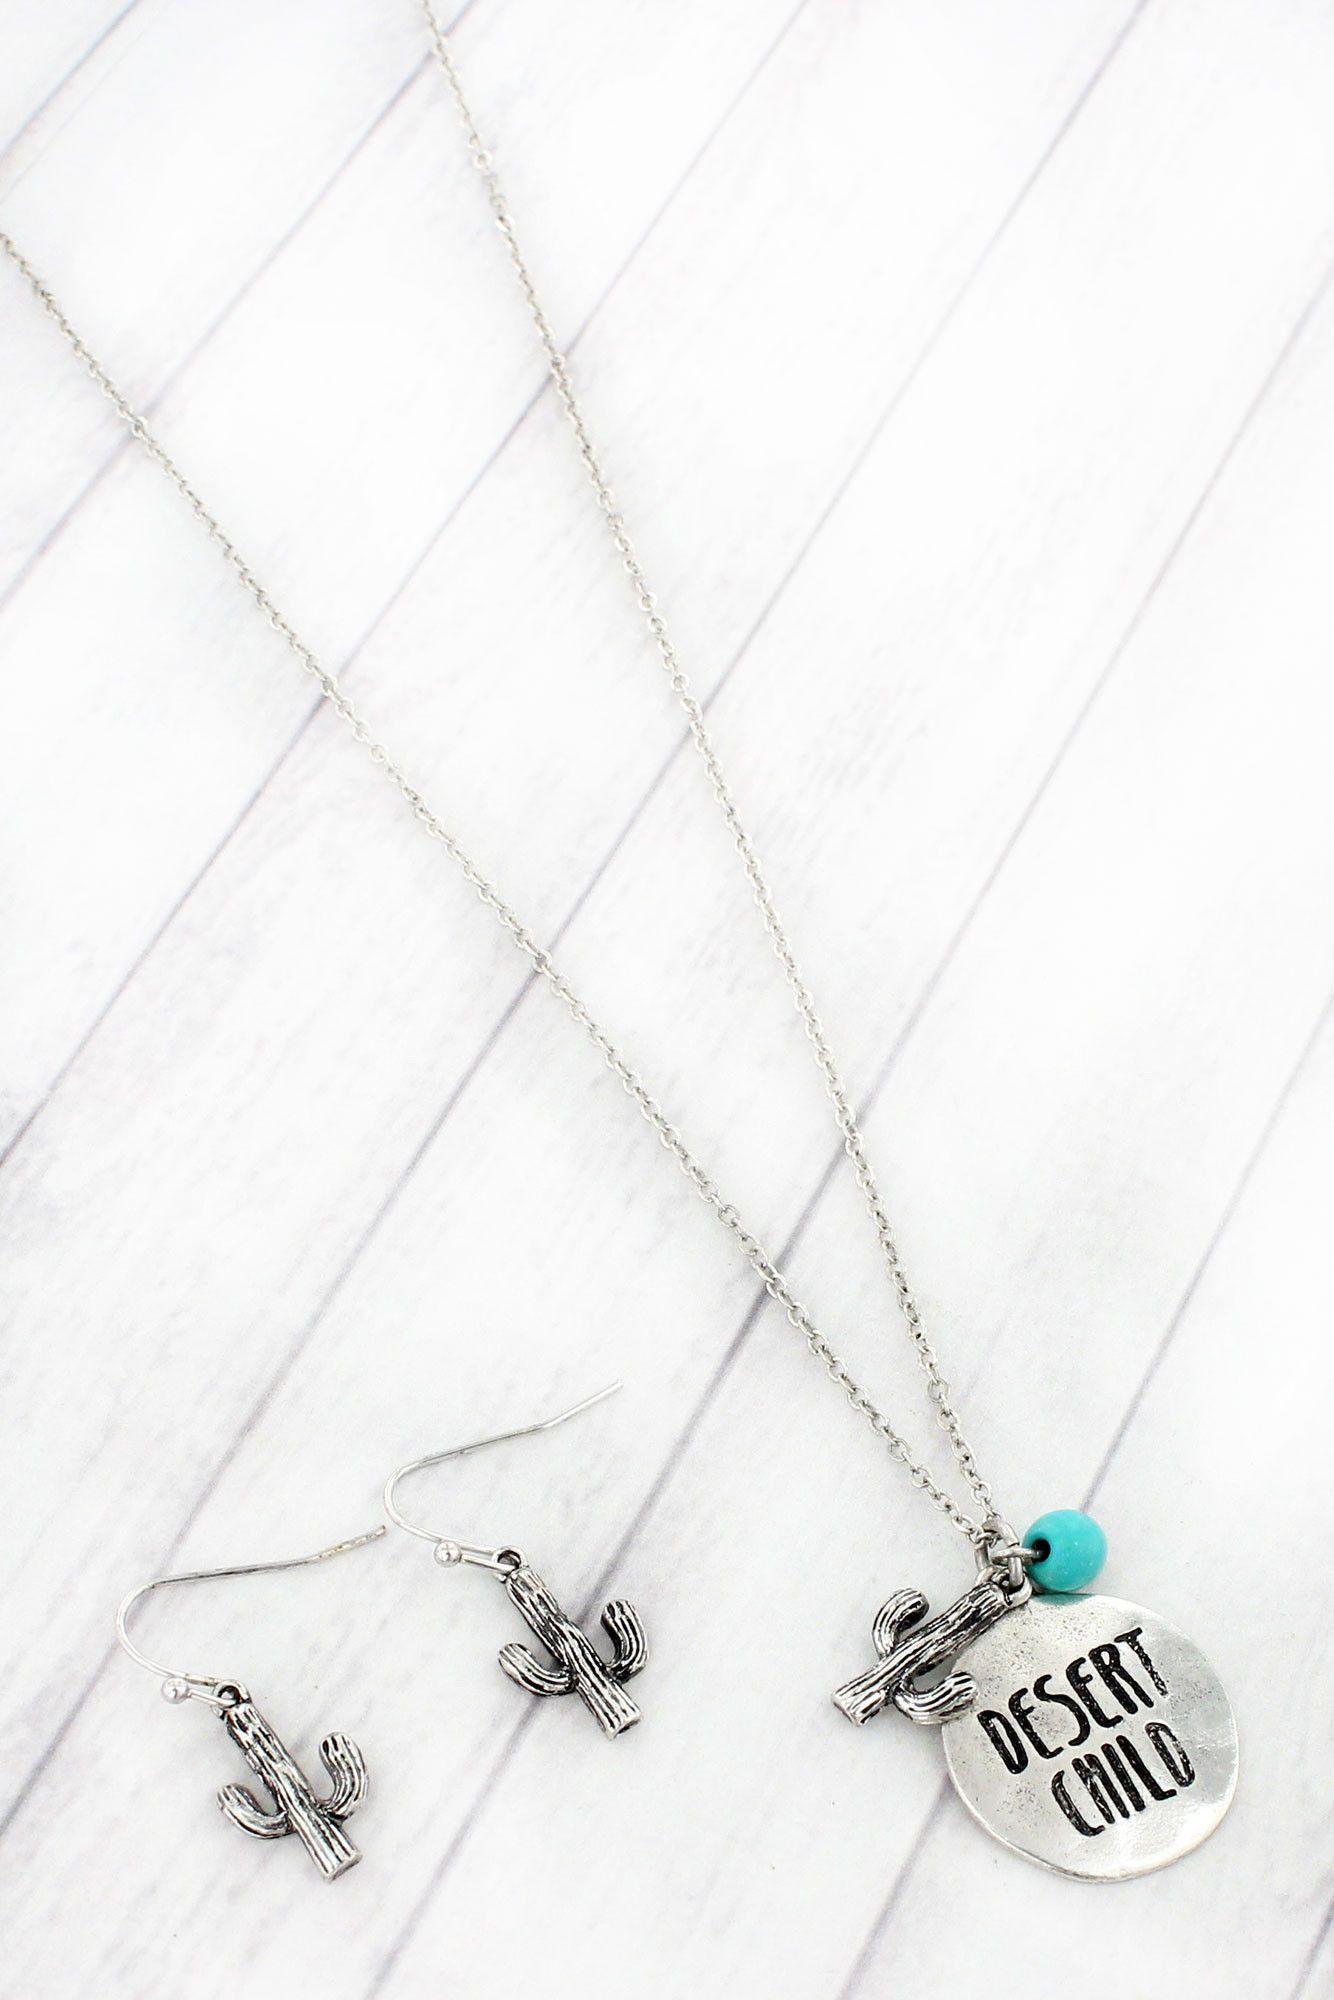 Burnished silvertone udesert childu necklace and earring set ss